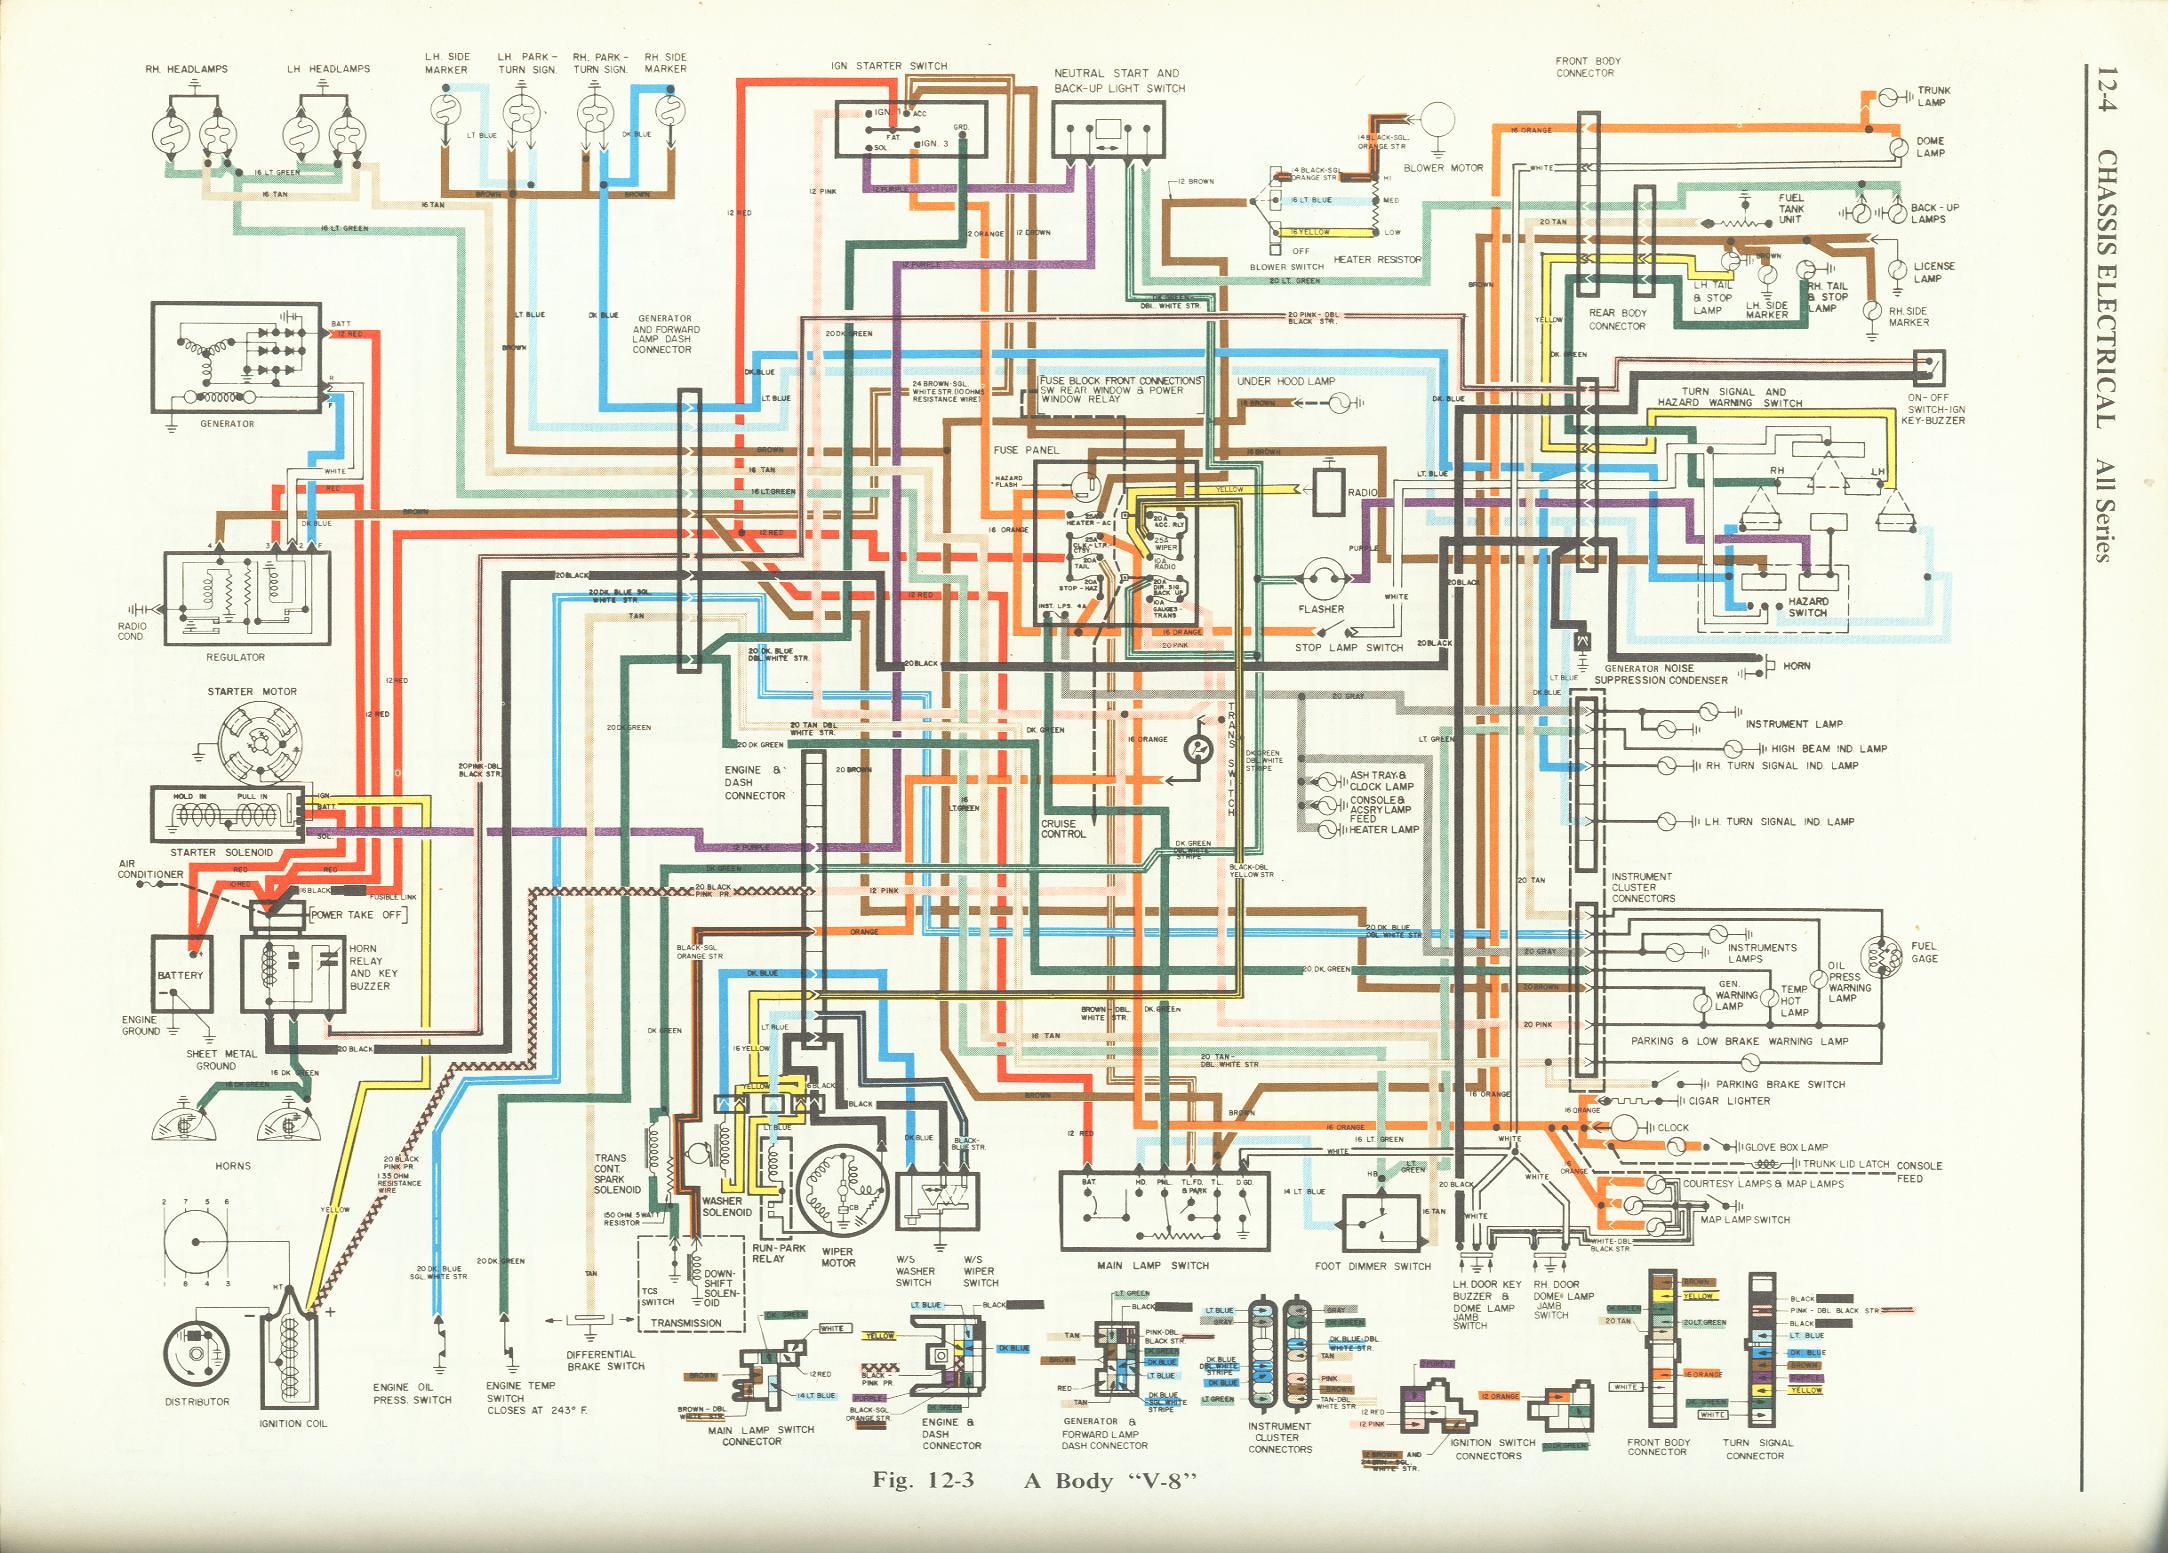 Wiring diagram | Hot Rod ForumHotrodders.com